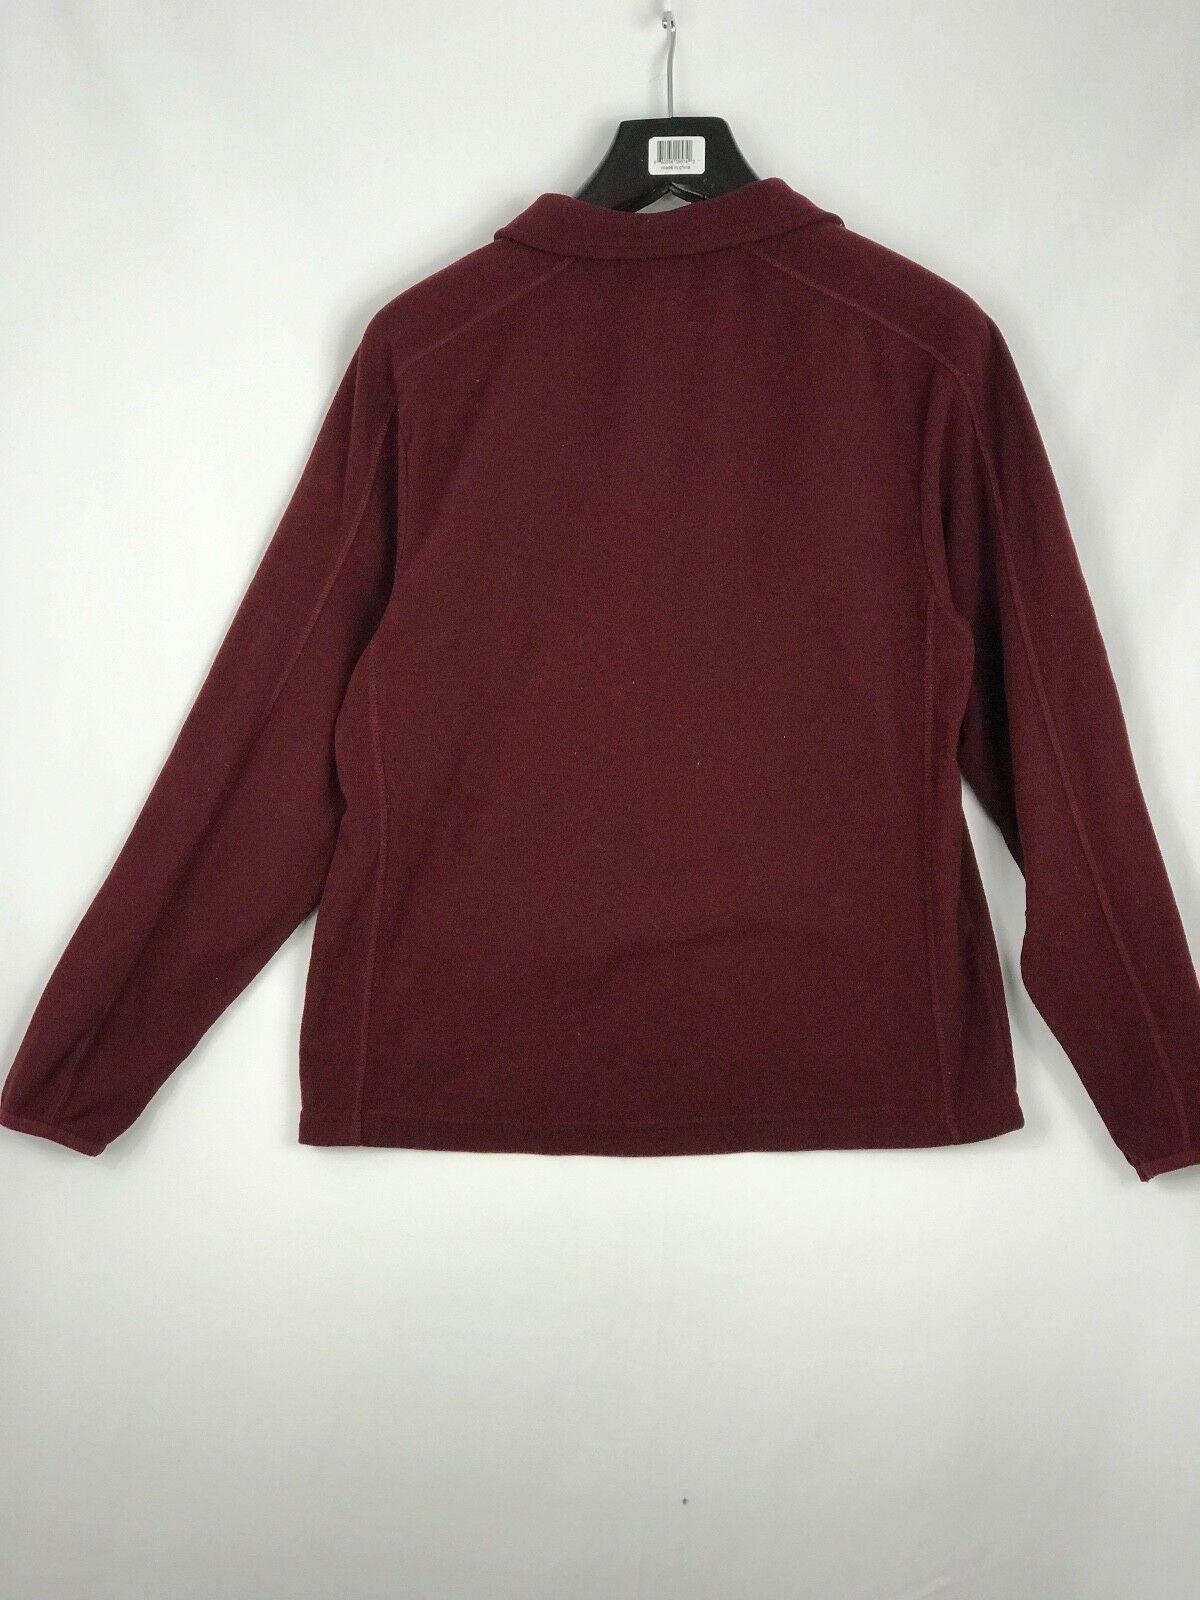 Champion Men Pullover Sweatshirt Fuzzy 3/4 Zip Long Sleeve Athletic Size S  image 2